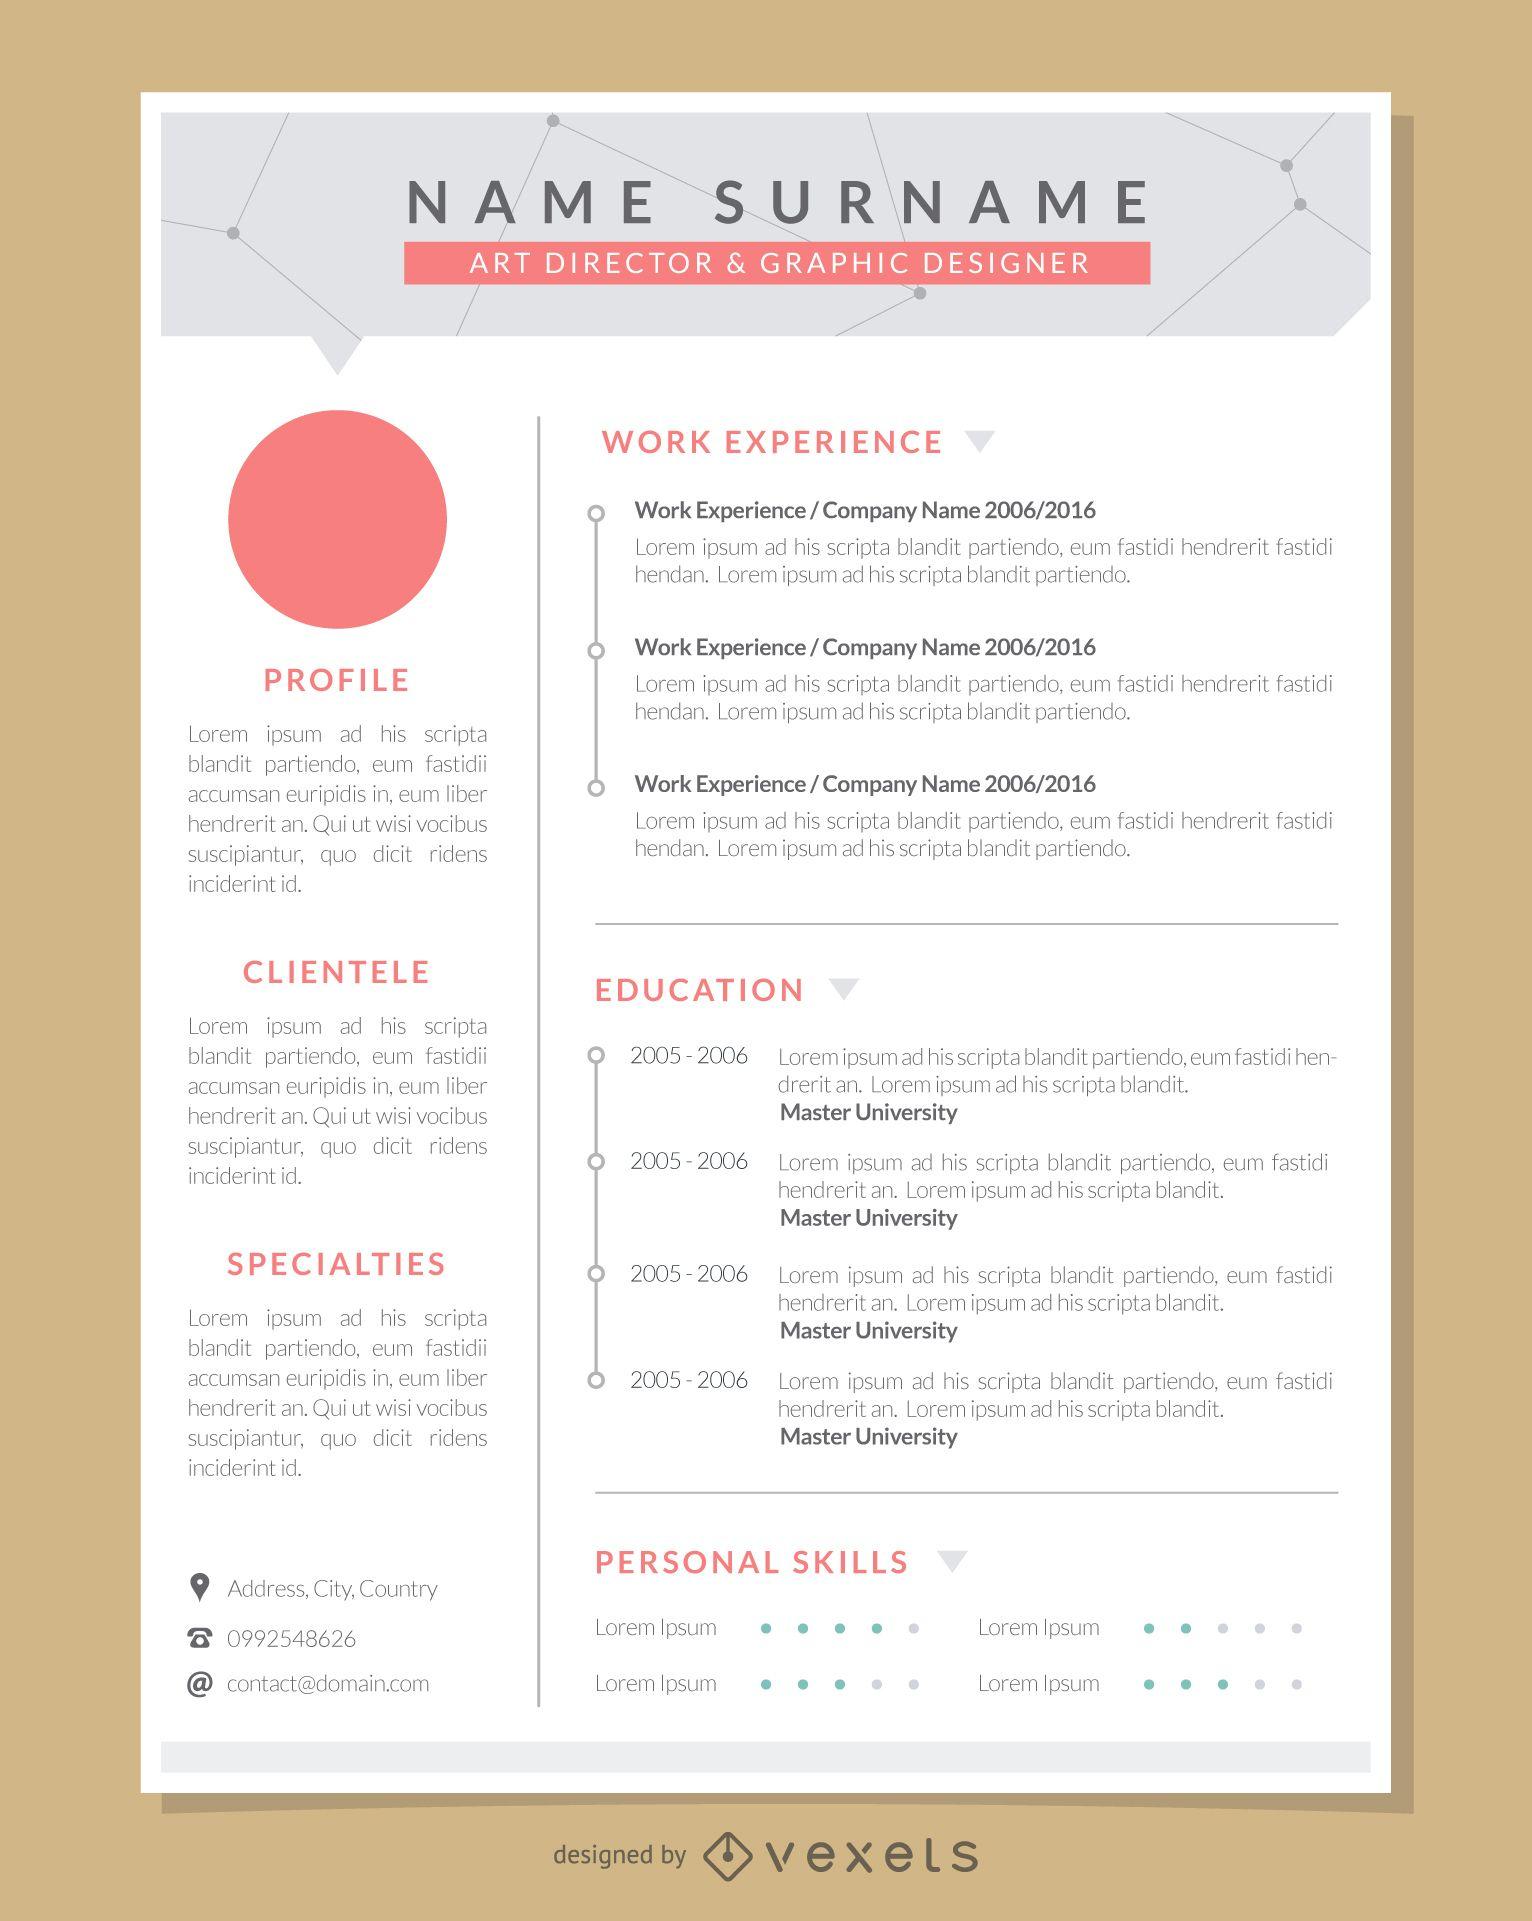 Plantilla de currículum profesional de artista gráfico